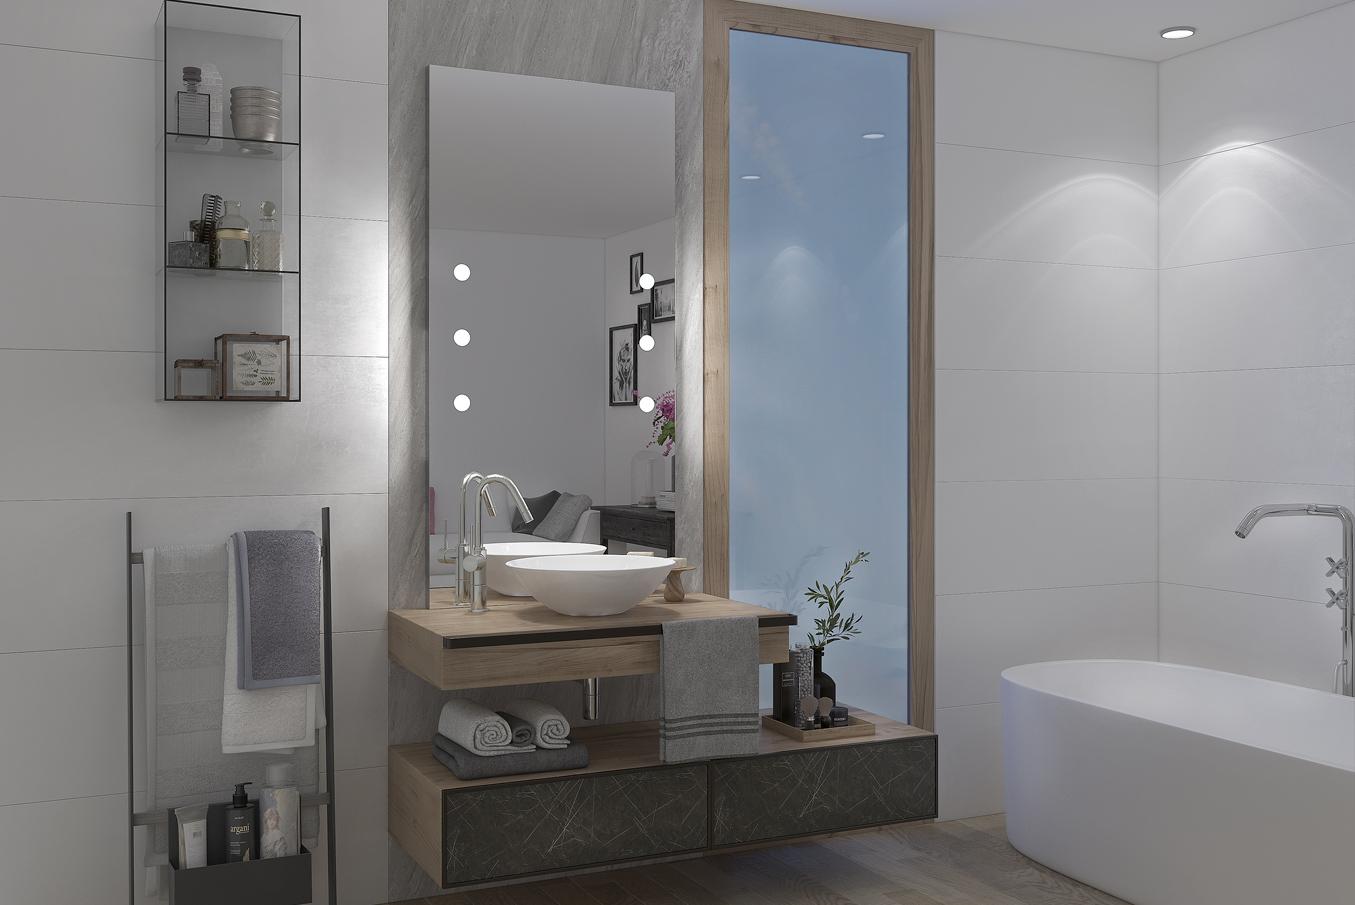 vertical rectangular frameless illuminated wall mirror for small bathroom, minimal modern wooden interior design